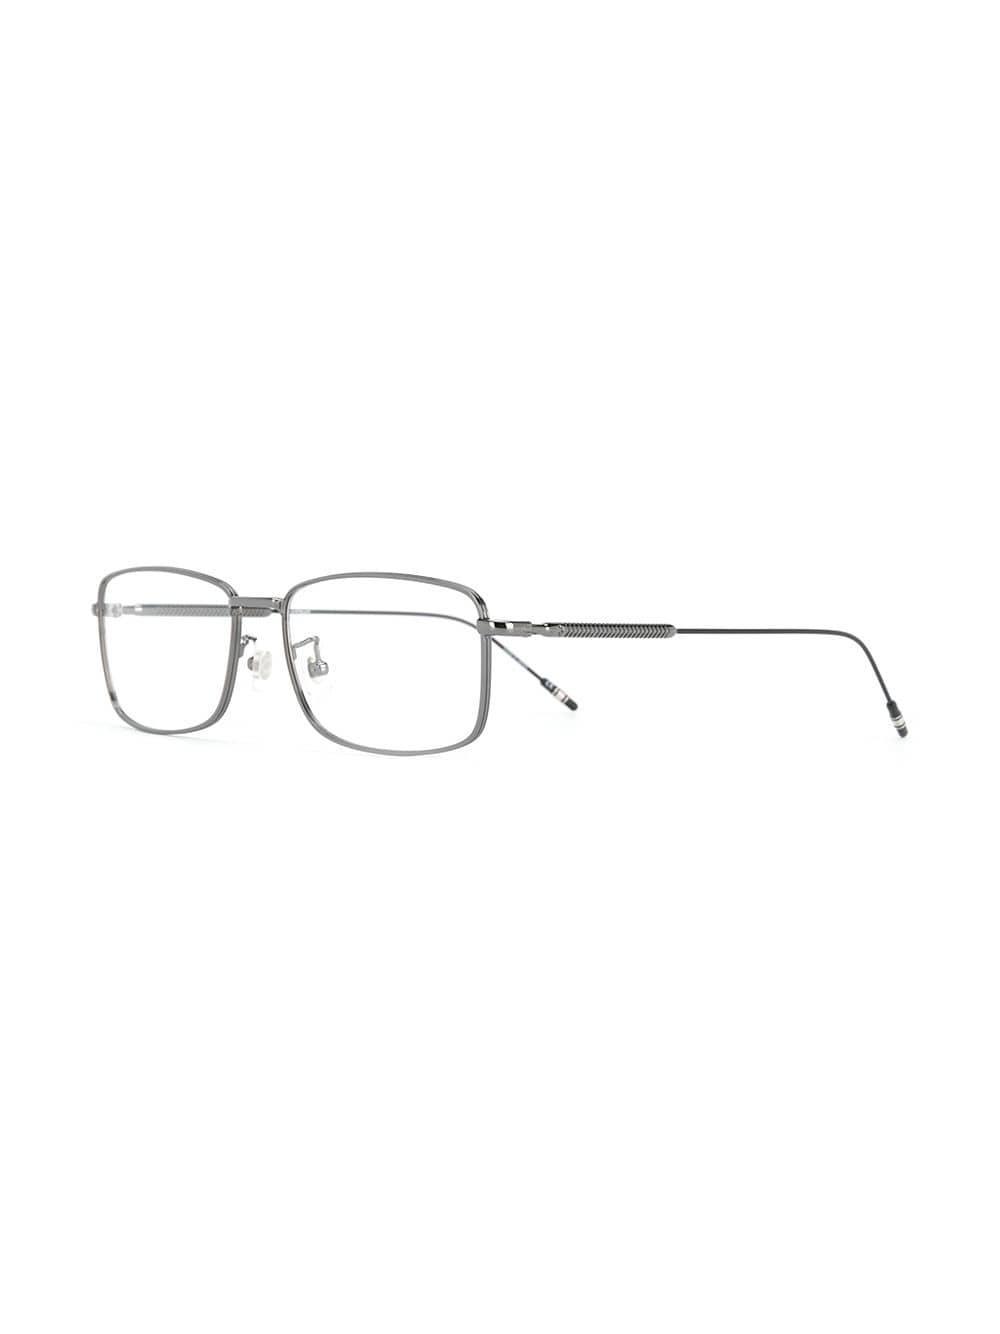 c766315a62 Montblanc - Black Rectangular Frame Glasses - Lyst. View fullscreen